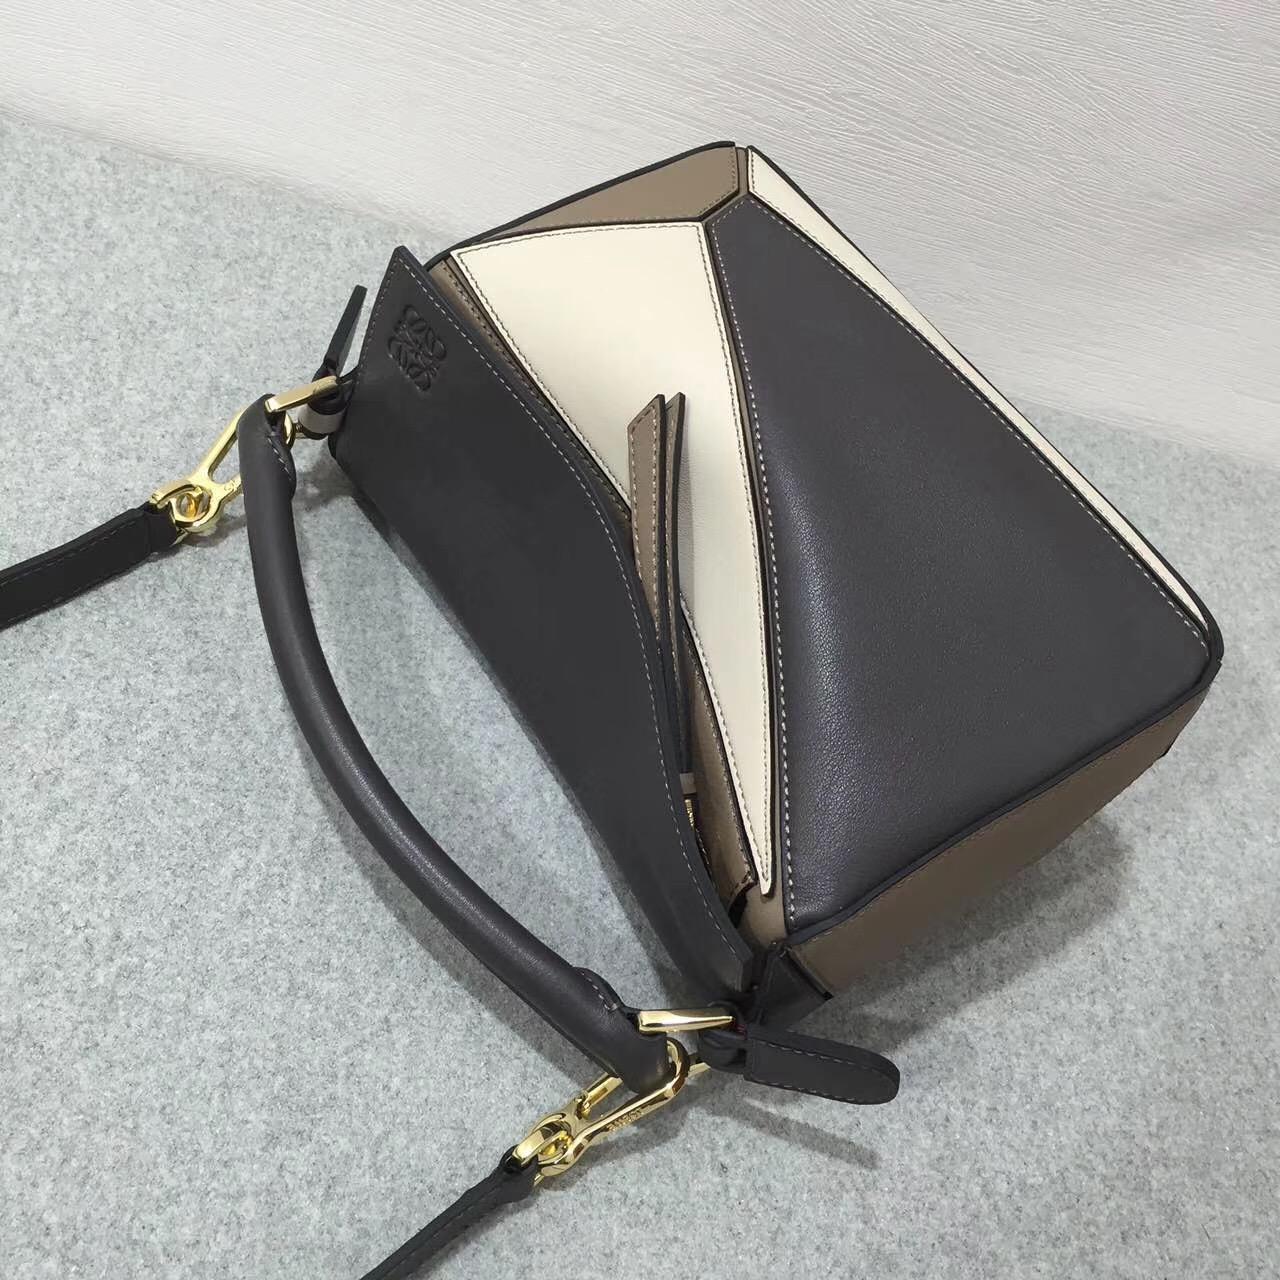 Loewe羅意威 几何包小号 Puzzle Small Bag Dark Taupe Multitone